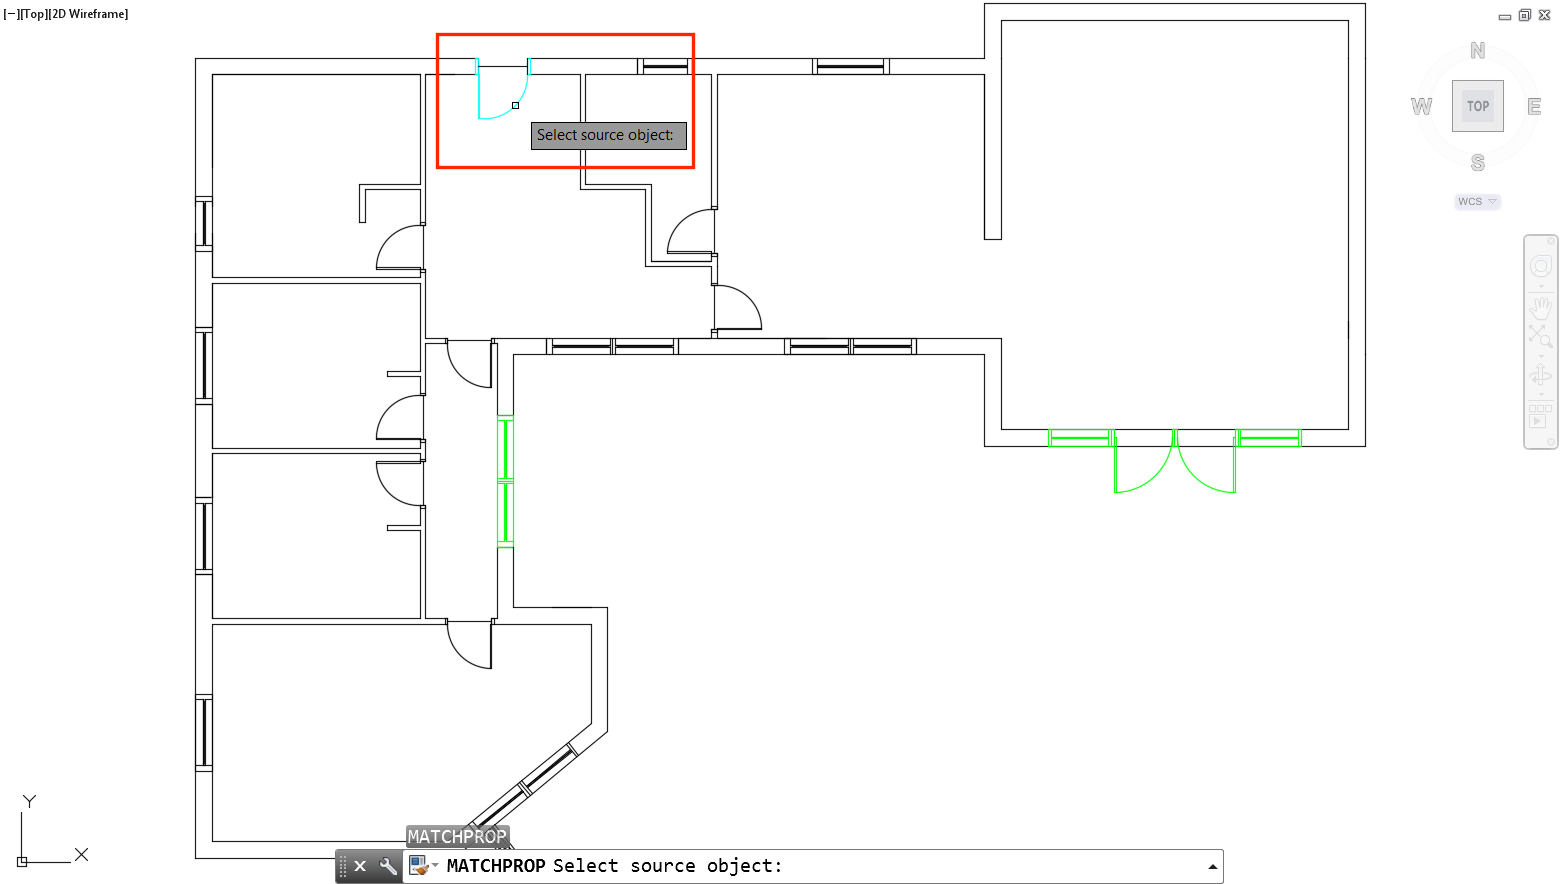 AutoCAD Training Article - Ch 3 - Screenshot15